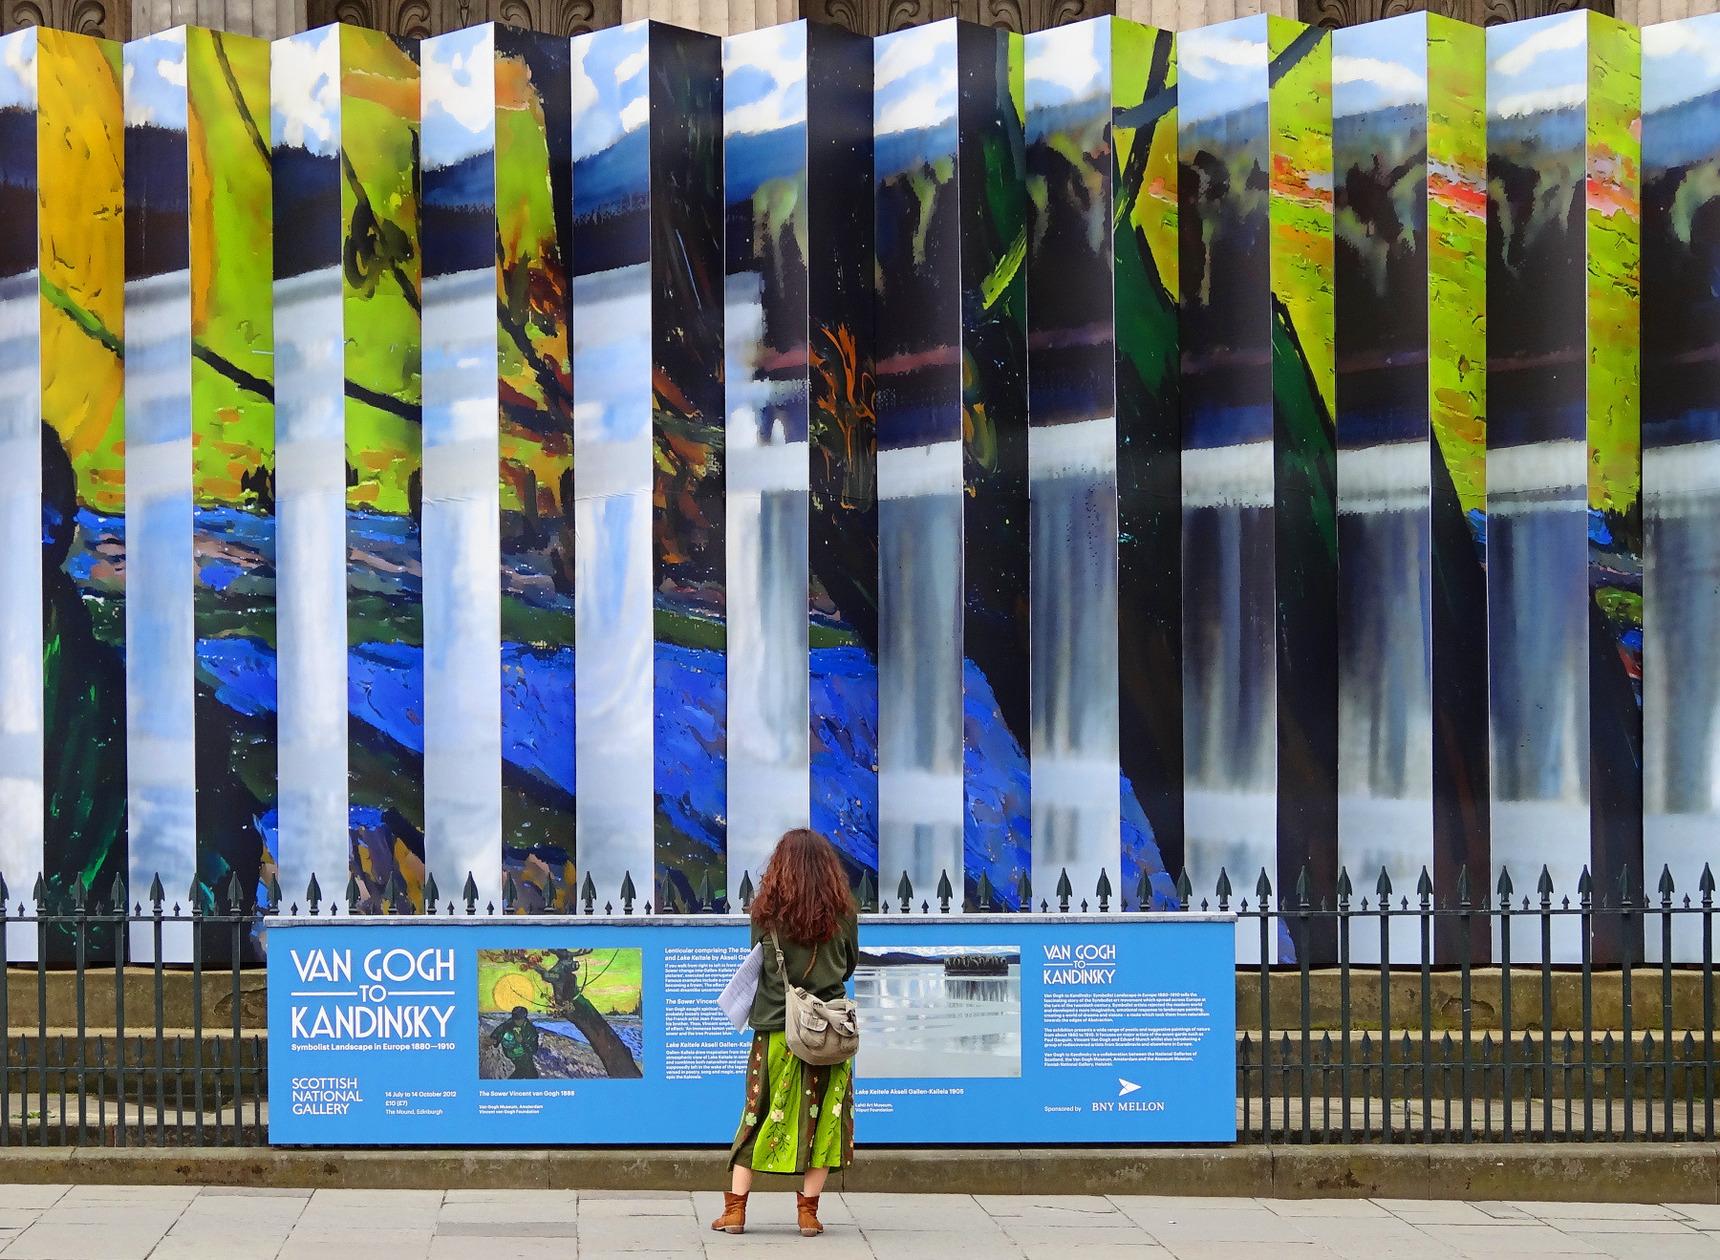 Van Gogh exhibition at the Royal Scottish Academy